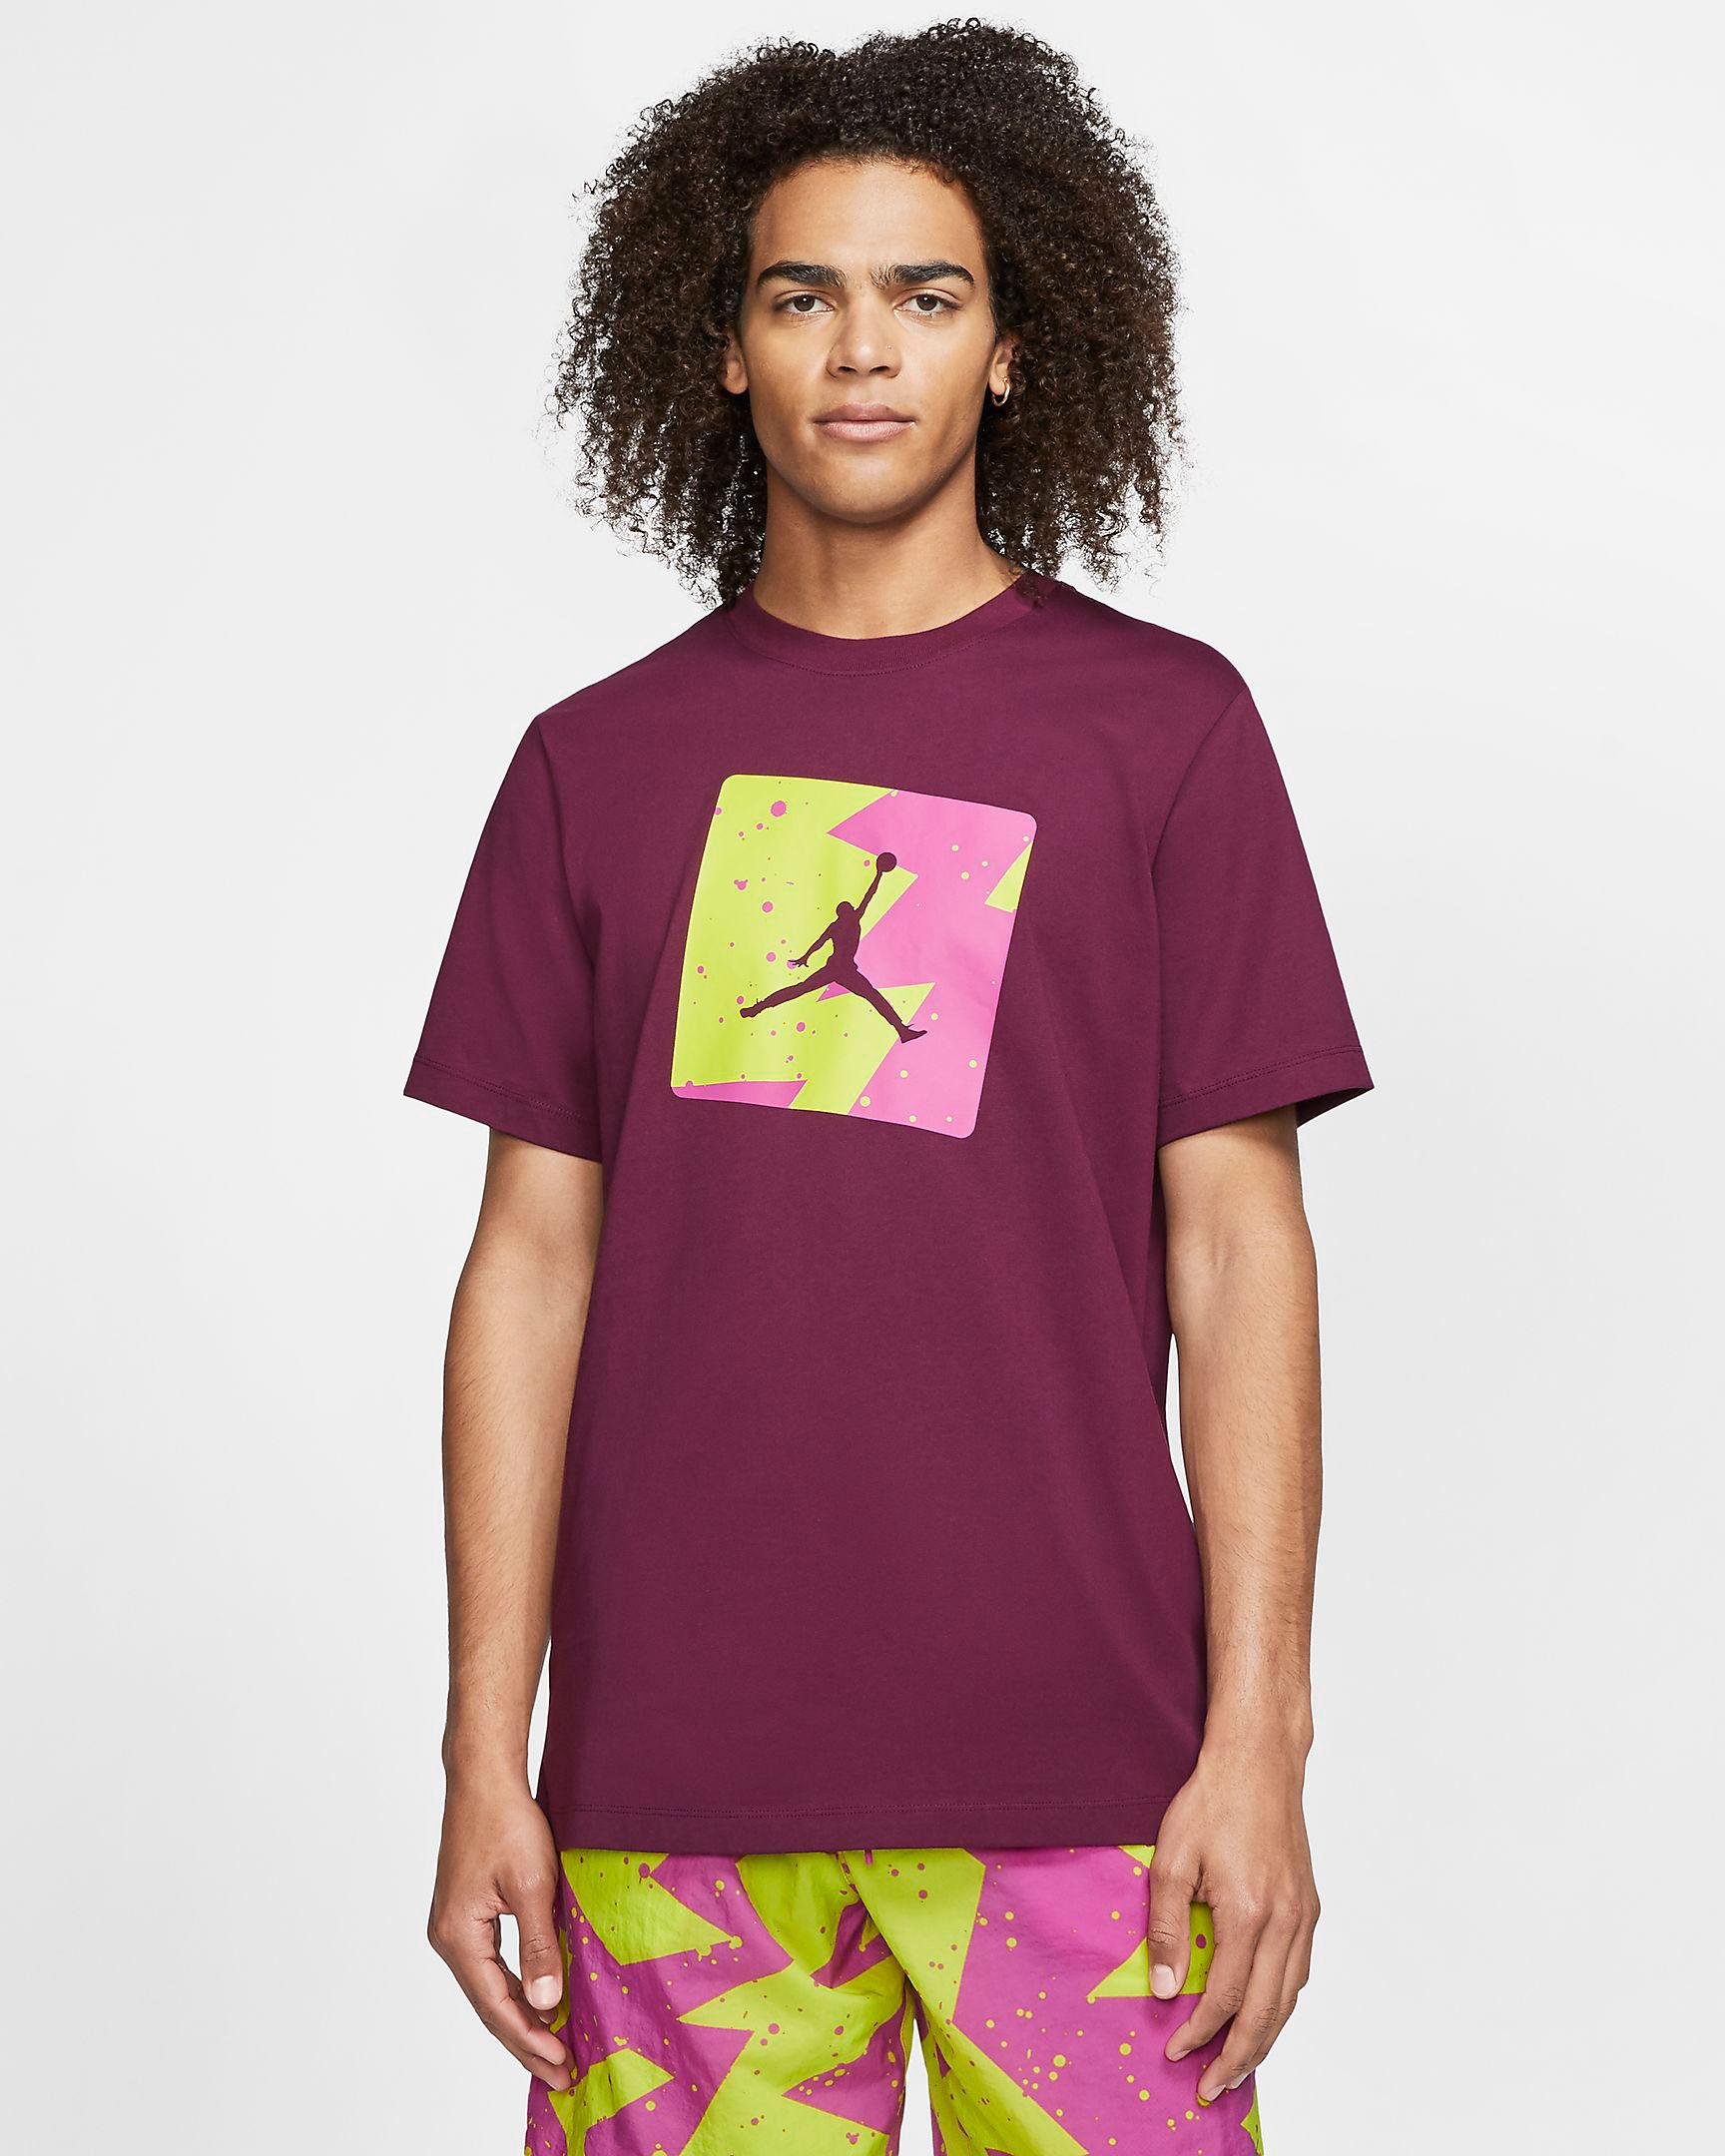 jordan-poolside-shirt-bordeaux-cyber-fuchsia